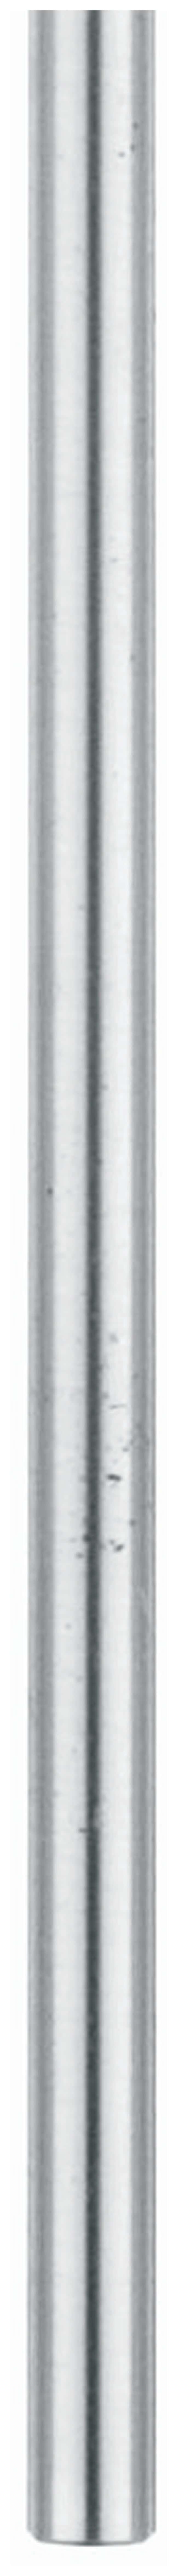 DWK Life SciencesWheaton Overhead Stirrer Accessories:Hotplates and Stirrers:Stirrer